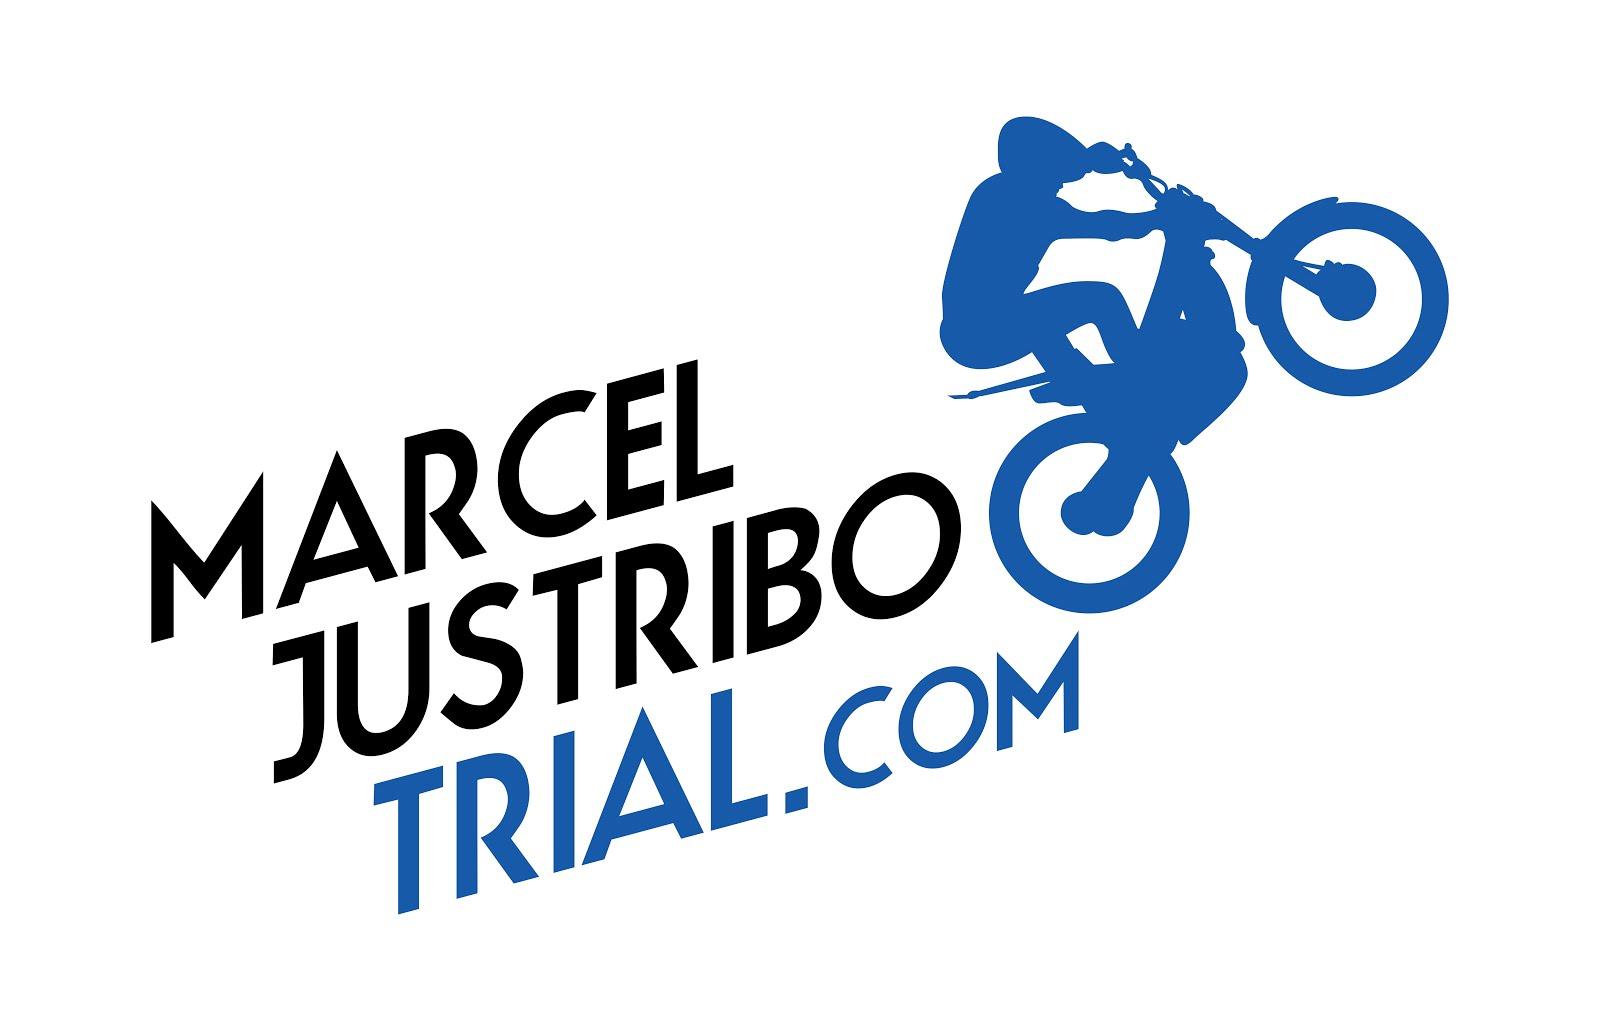 MARCEL JUSTRIBÓ TRIAL.COM